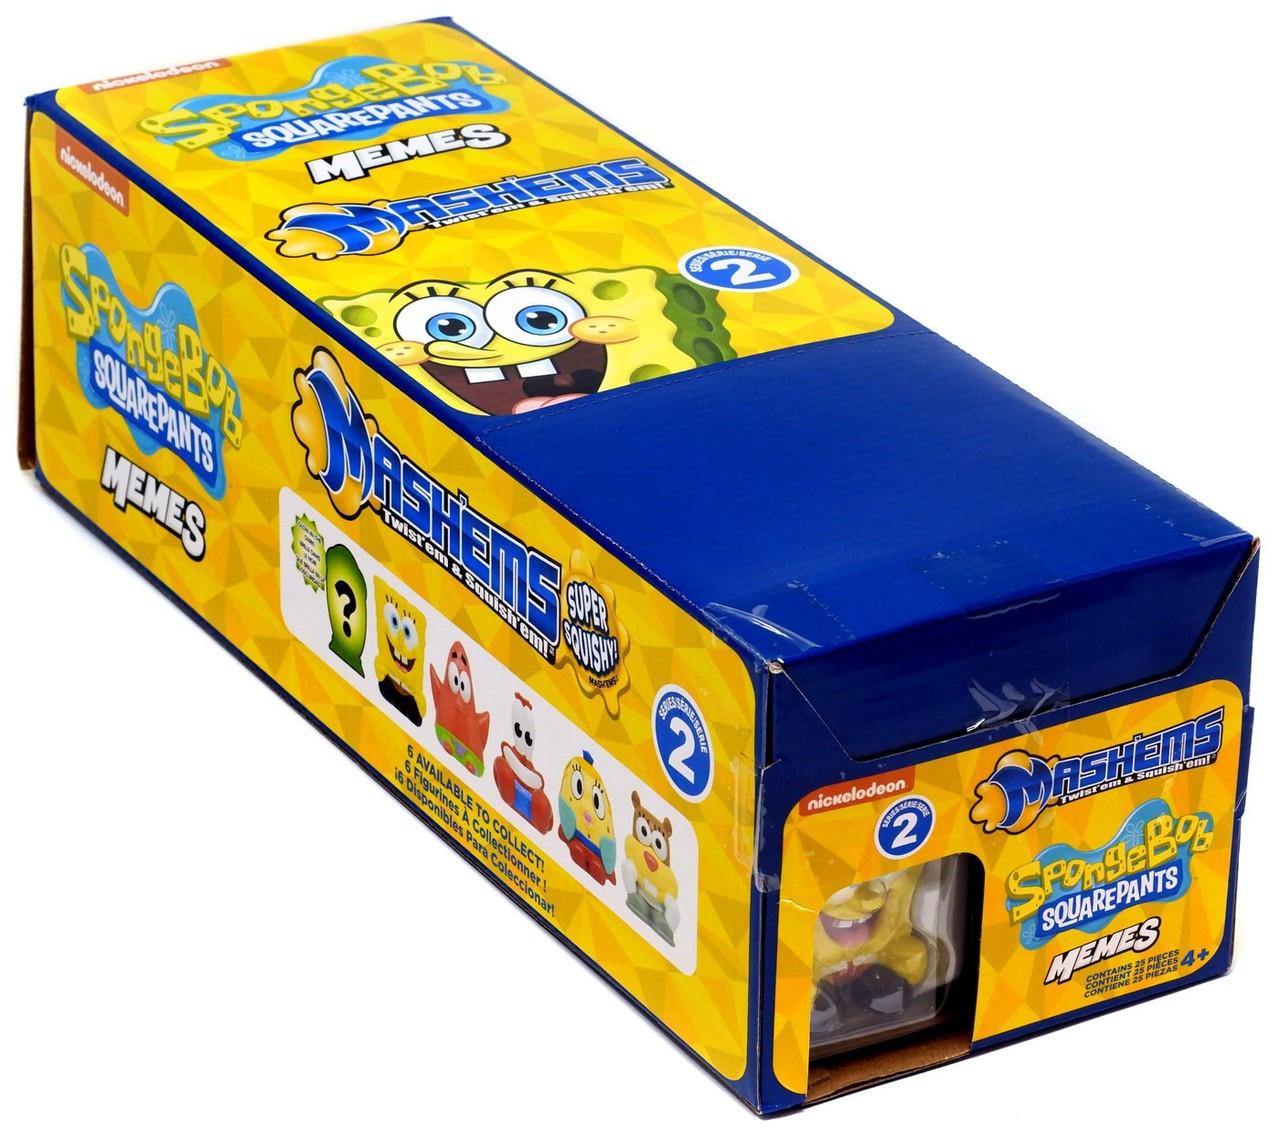 Spongebob squarepants mashems series 2 memes mystery box 25 packs tech4kids toywiz